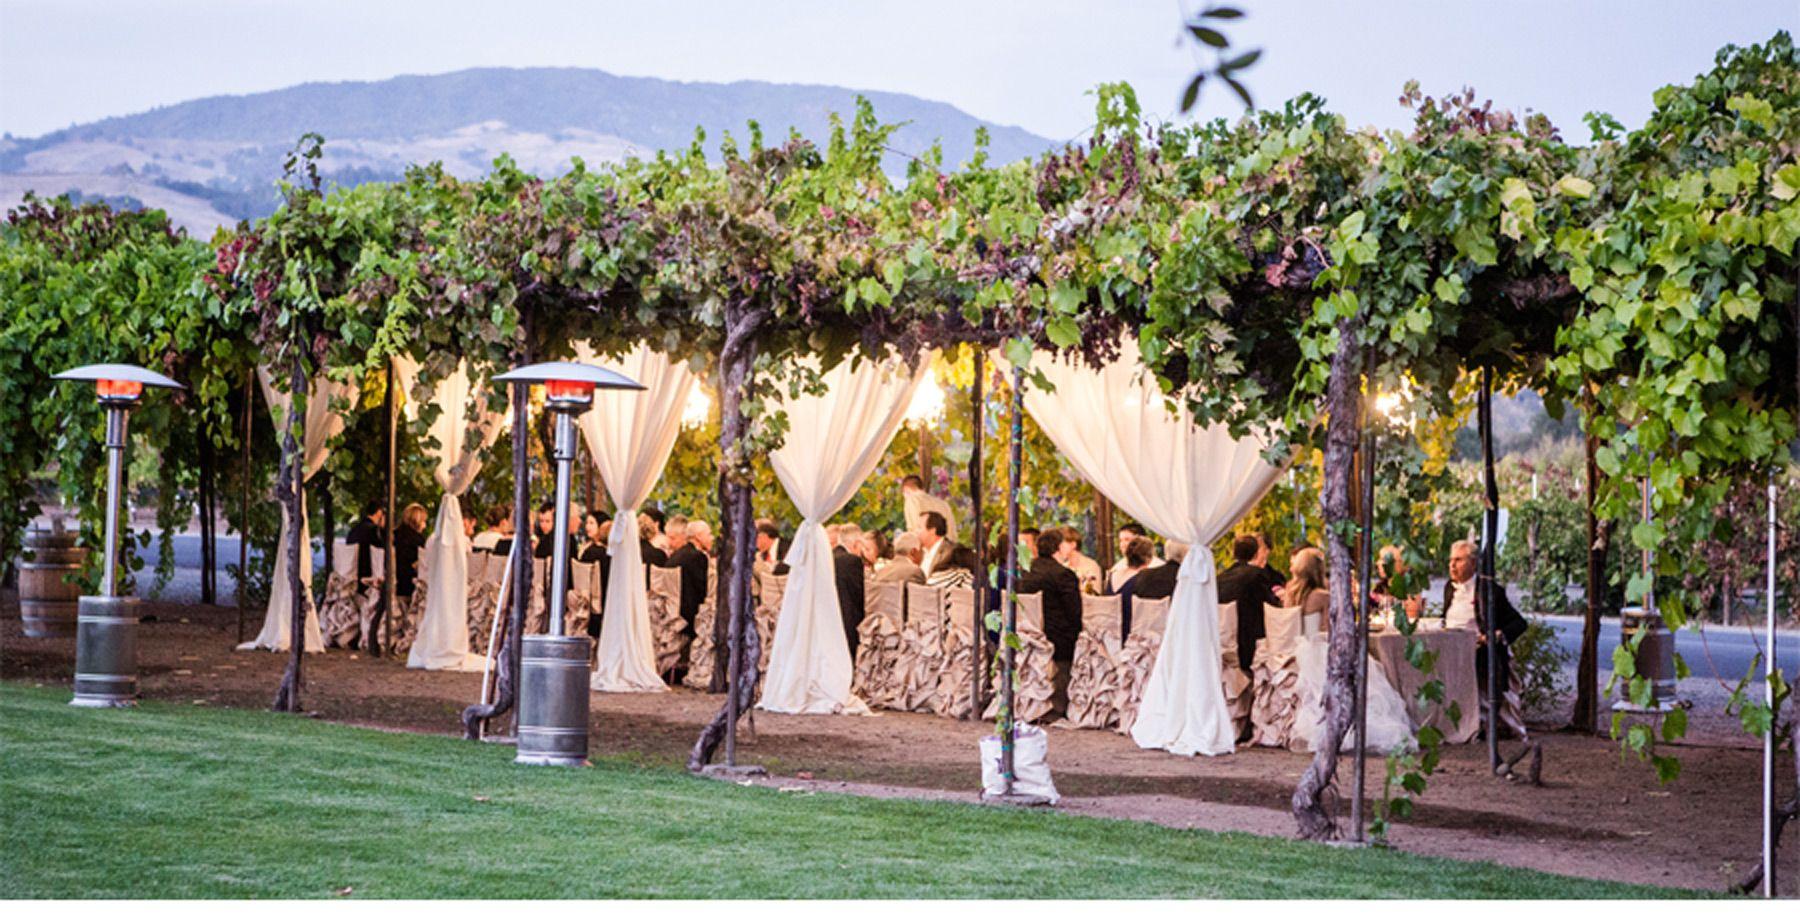 vineyard california italian napa winery weddings venues muse outdoor reception northern bride italy france york venue wine events inspired andrew